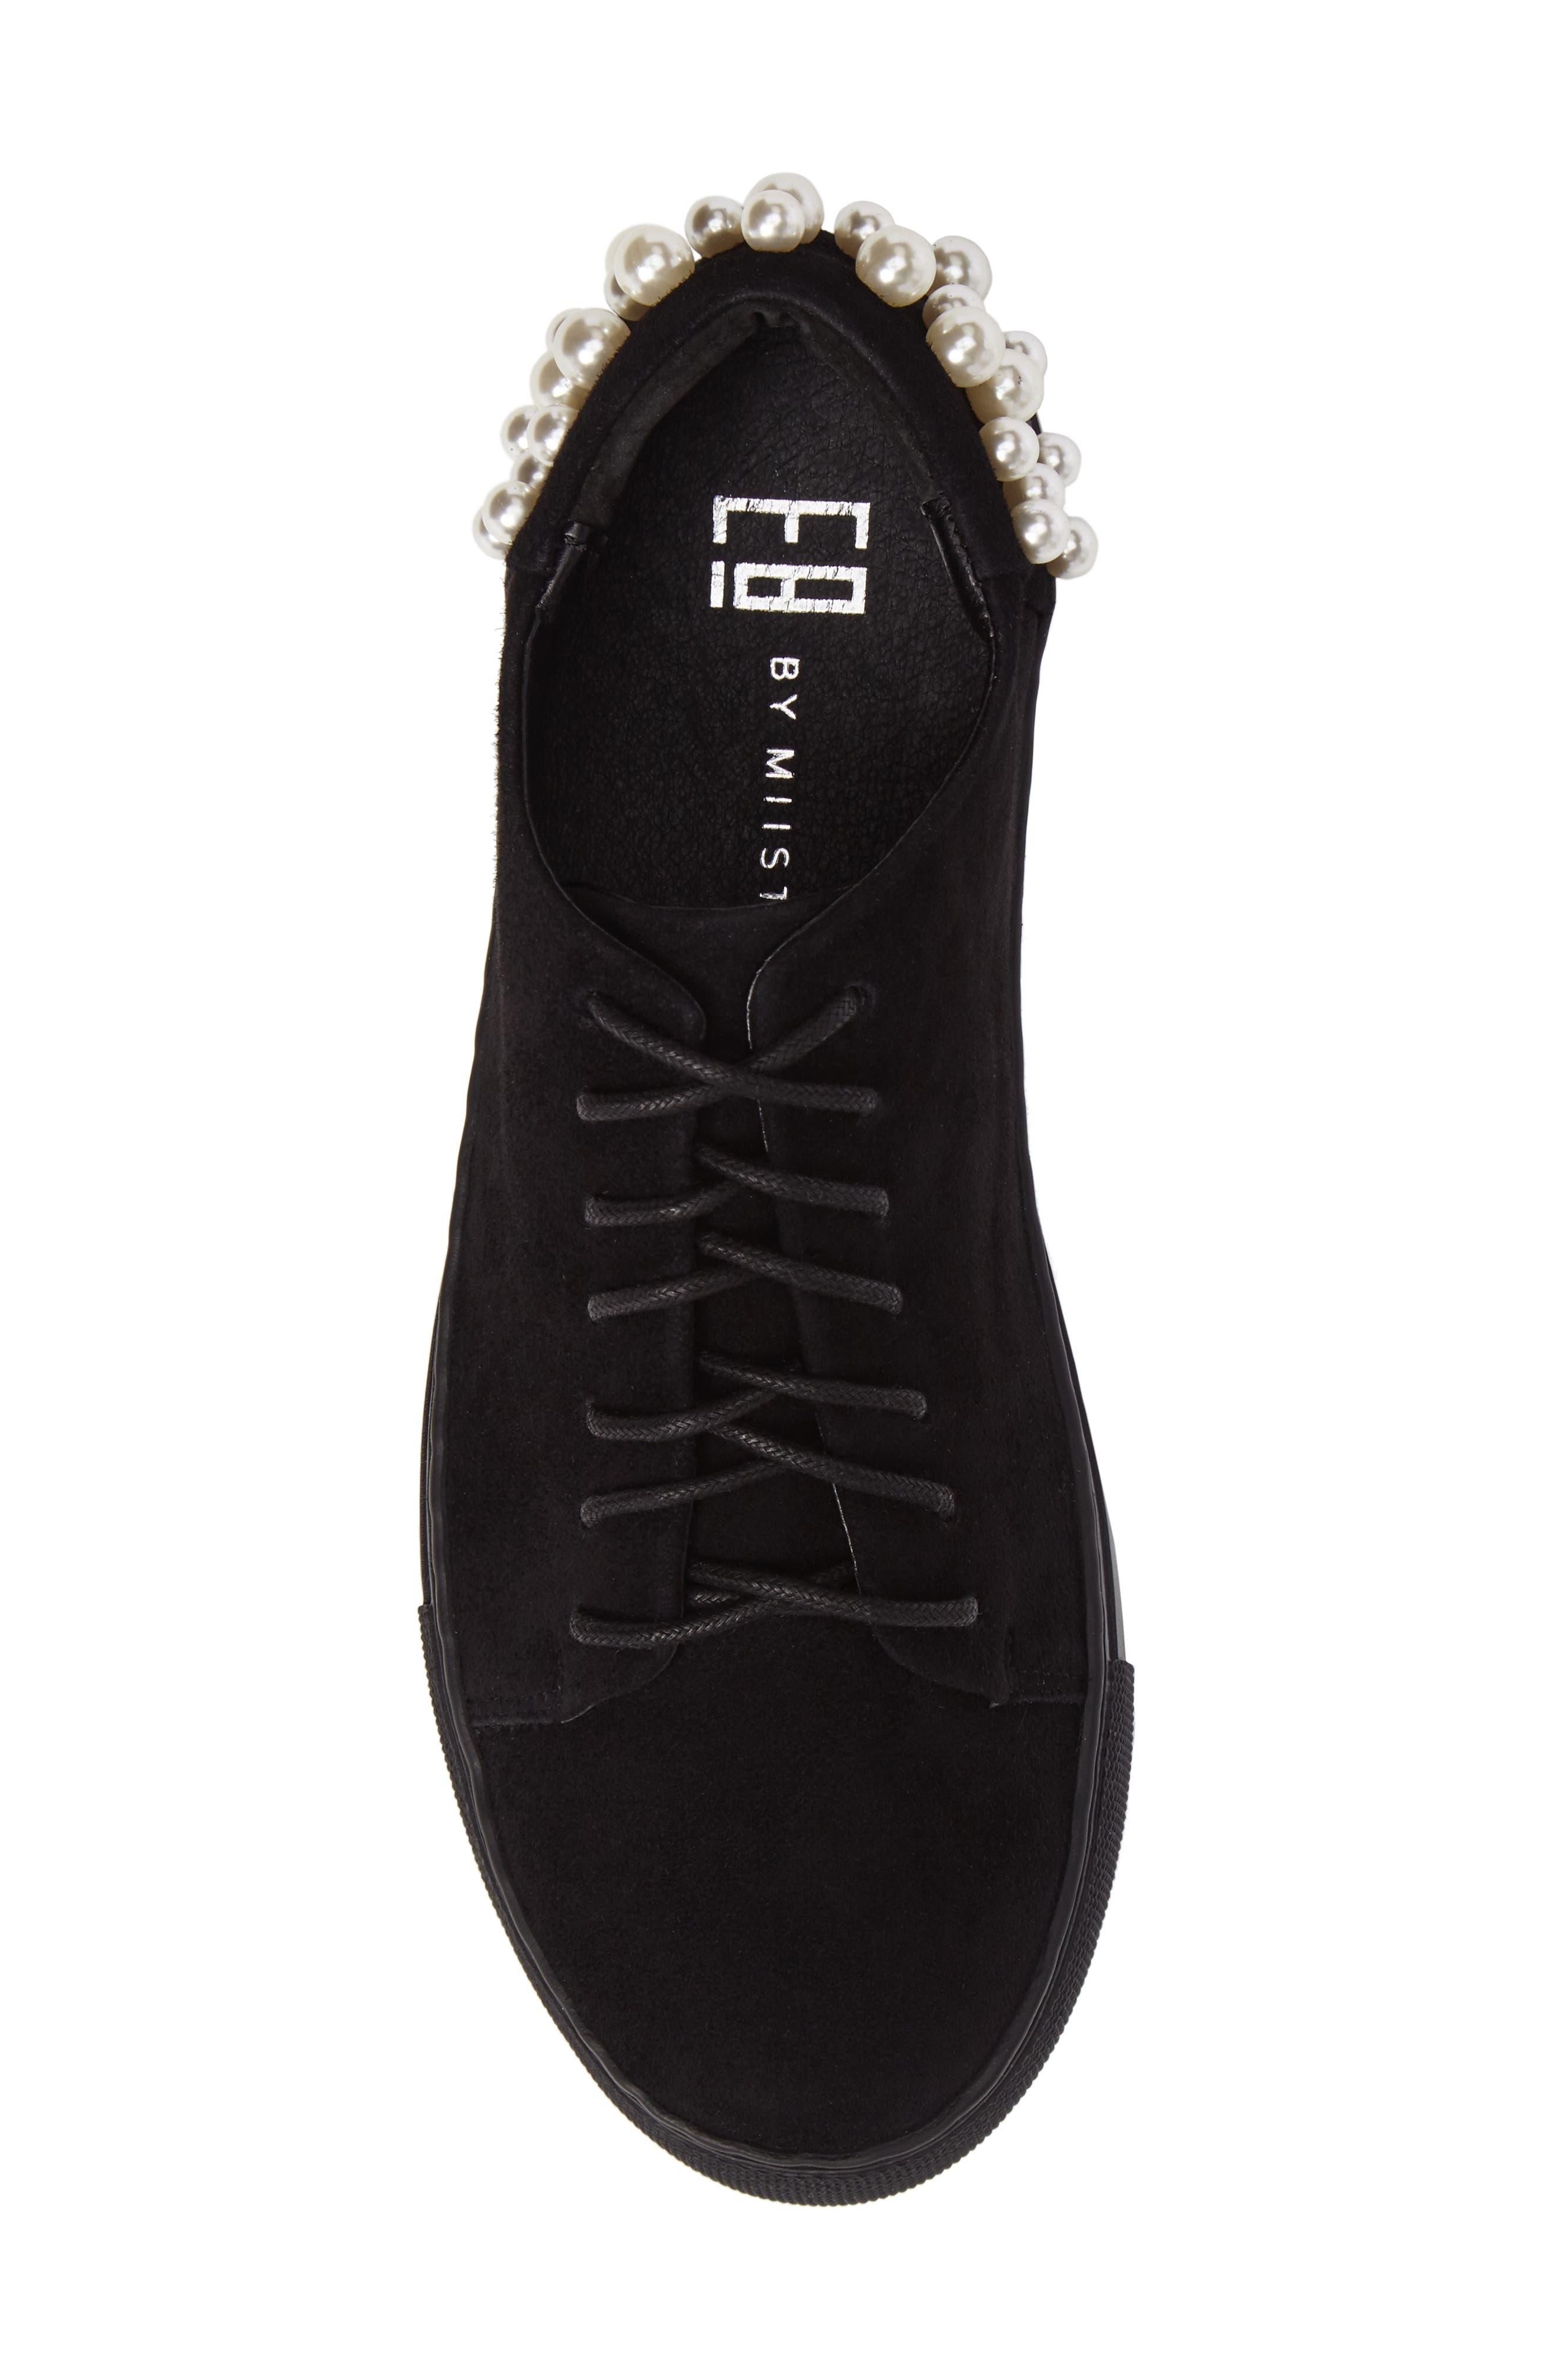 Haig Embellished Sneaker,                             Alternate thumbnail 5, color,                             Black